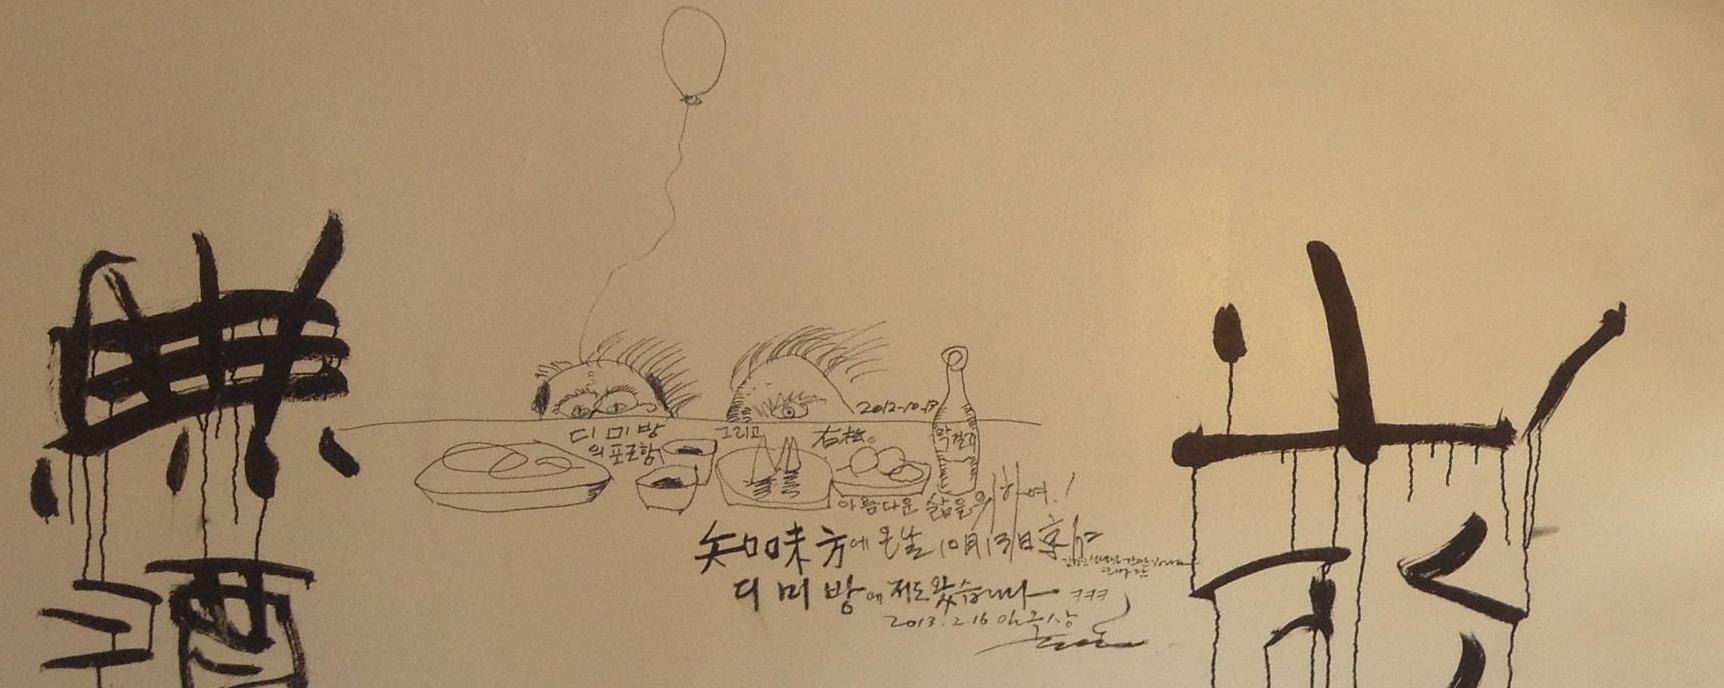 2014-04-08_10_banner